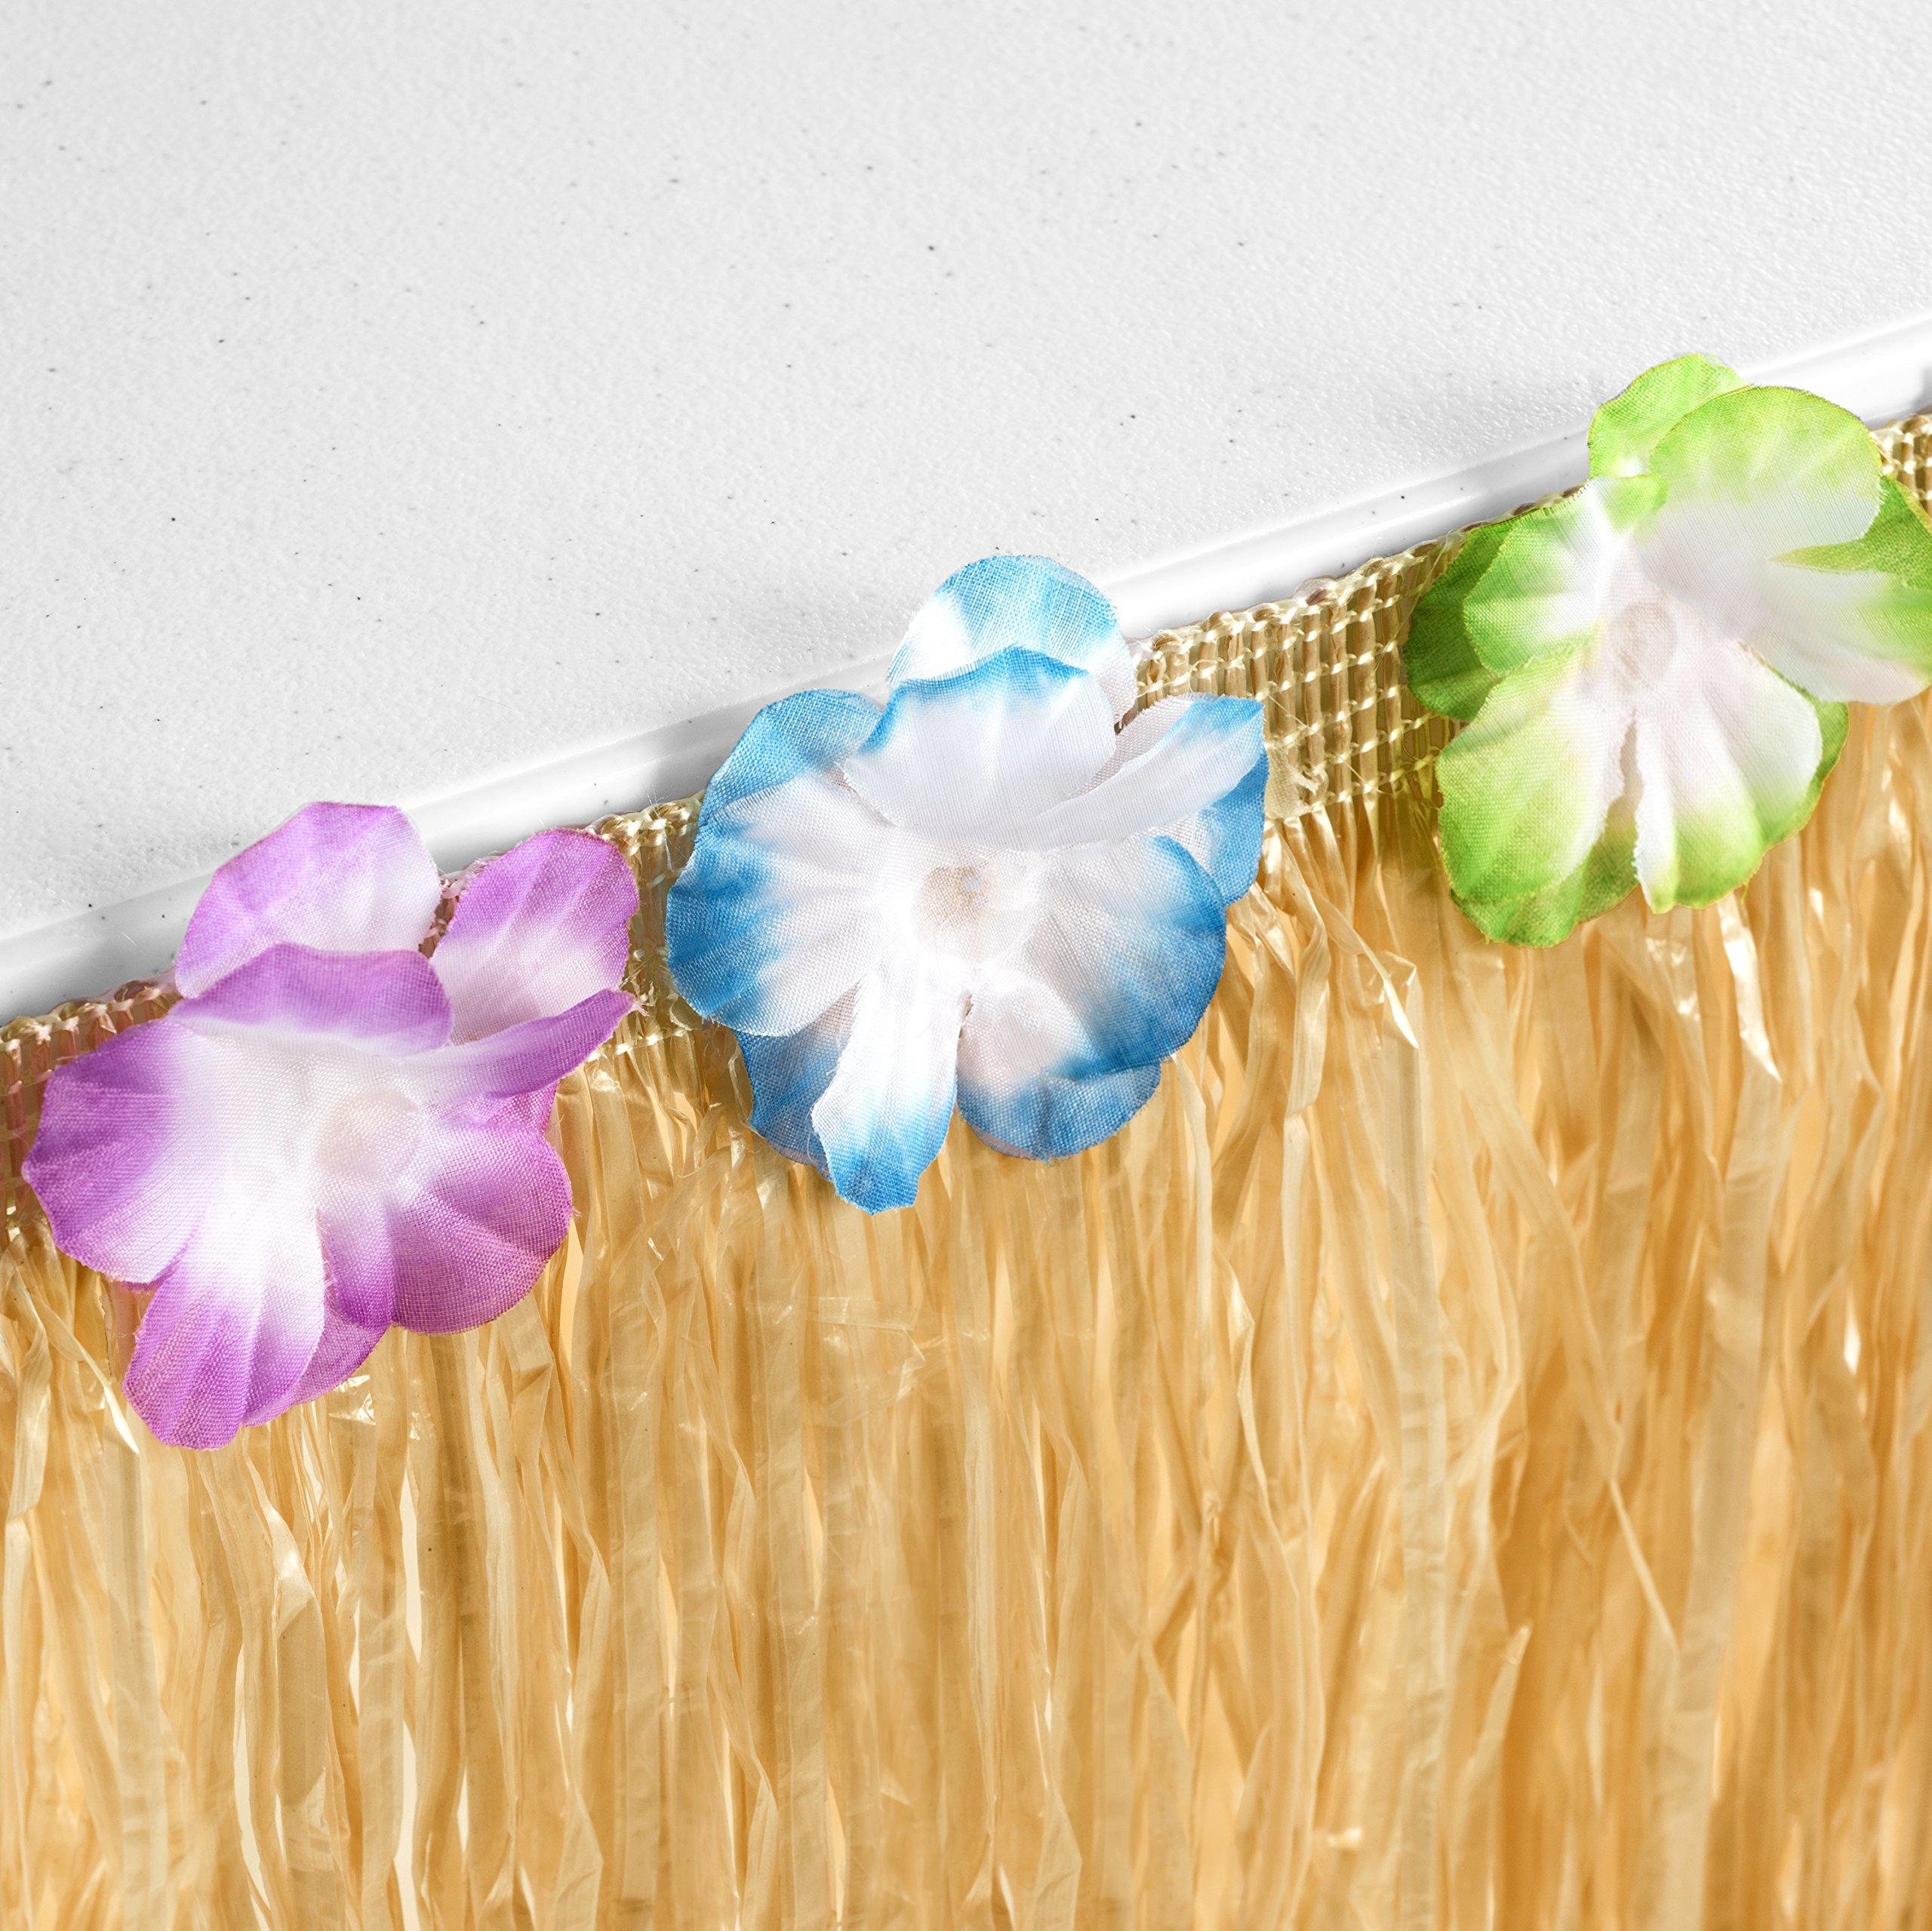 Hawaiian Luau Grass Table Skirt: BONUS 12 Hibiscus Flowers | Includes Adhesive | Perfect Beach, Tiki, Tropical, Island, Party, Luau Decoration 9ft by Luau Essentials (Image #6)